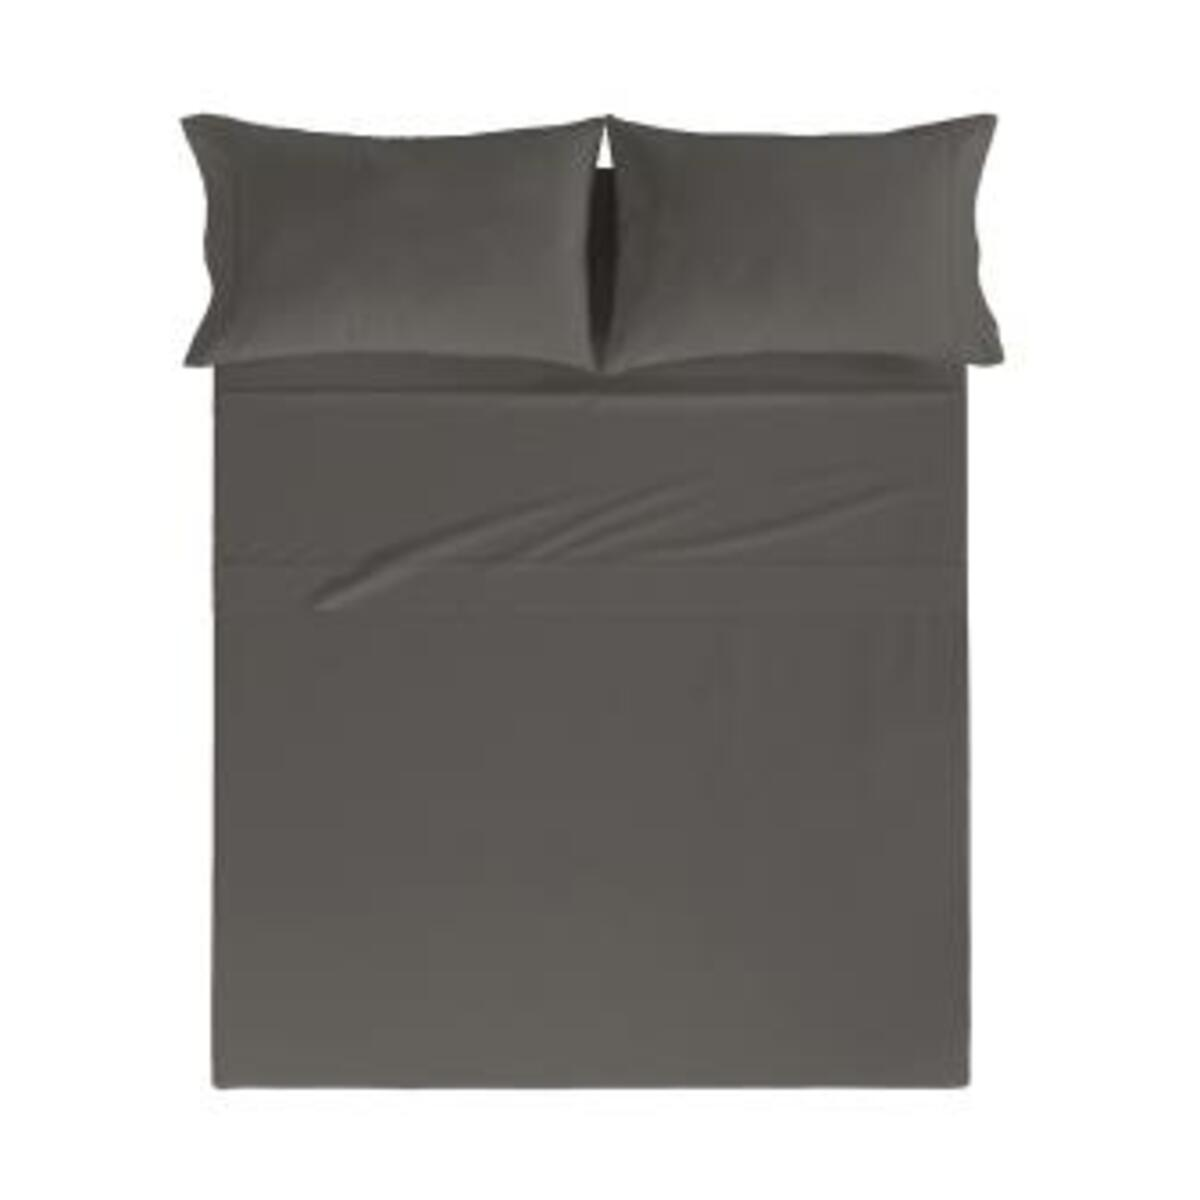 Drap de lit en coton percale anthracita 160x280